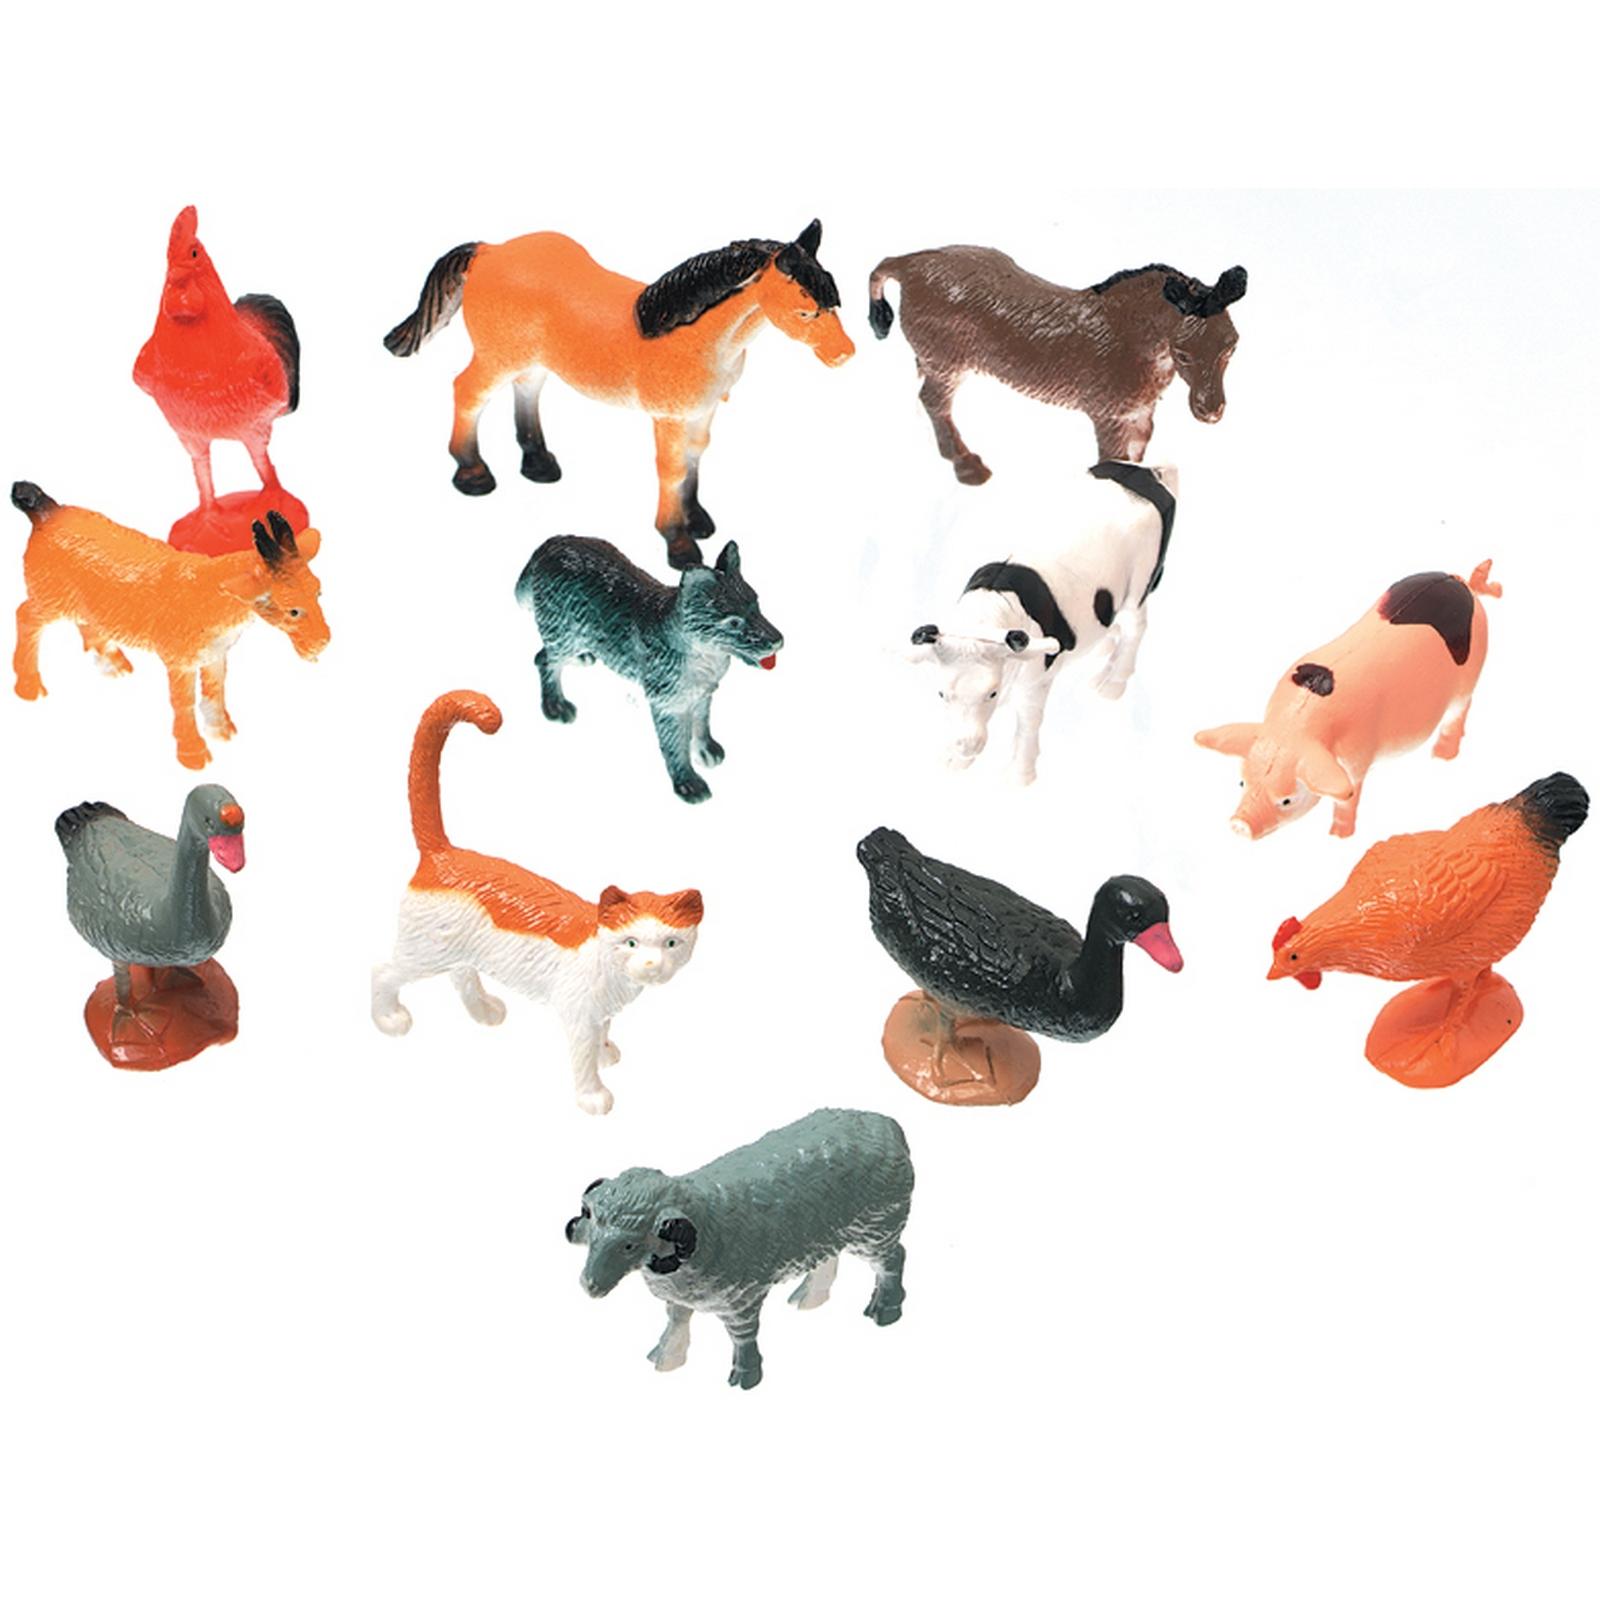 Creatures Inc. Farm Animals 12/Pkg PartNumber: 021V005613480000P KsnValue: 5613480 MfgPartNumber: 1029-08